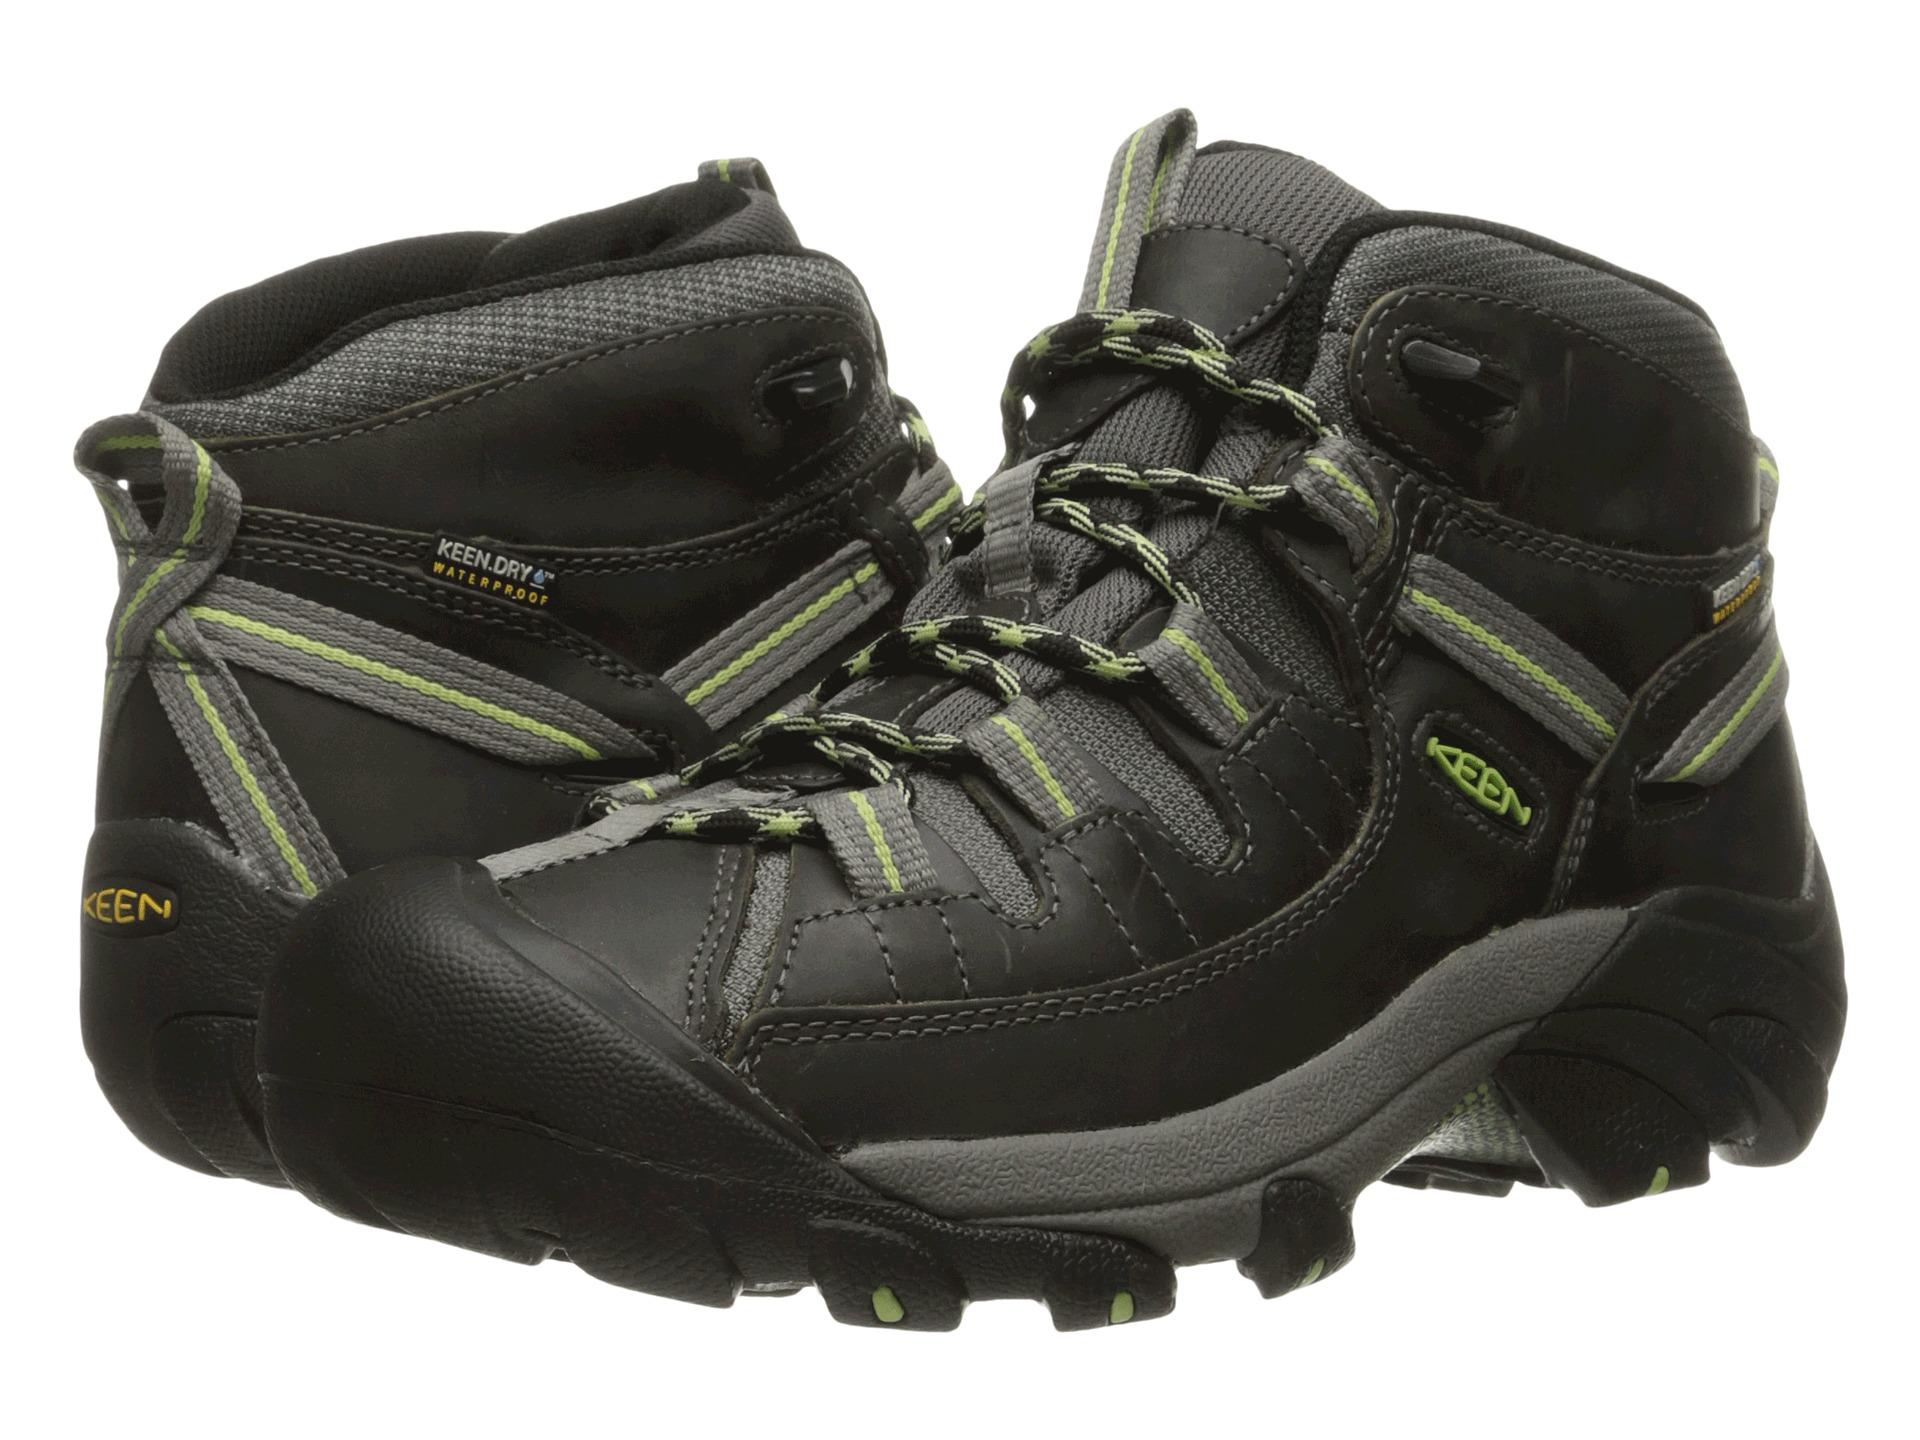 Keen Hiking Shoes Run Small